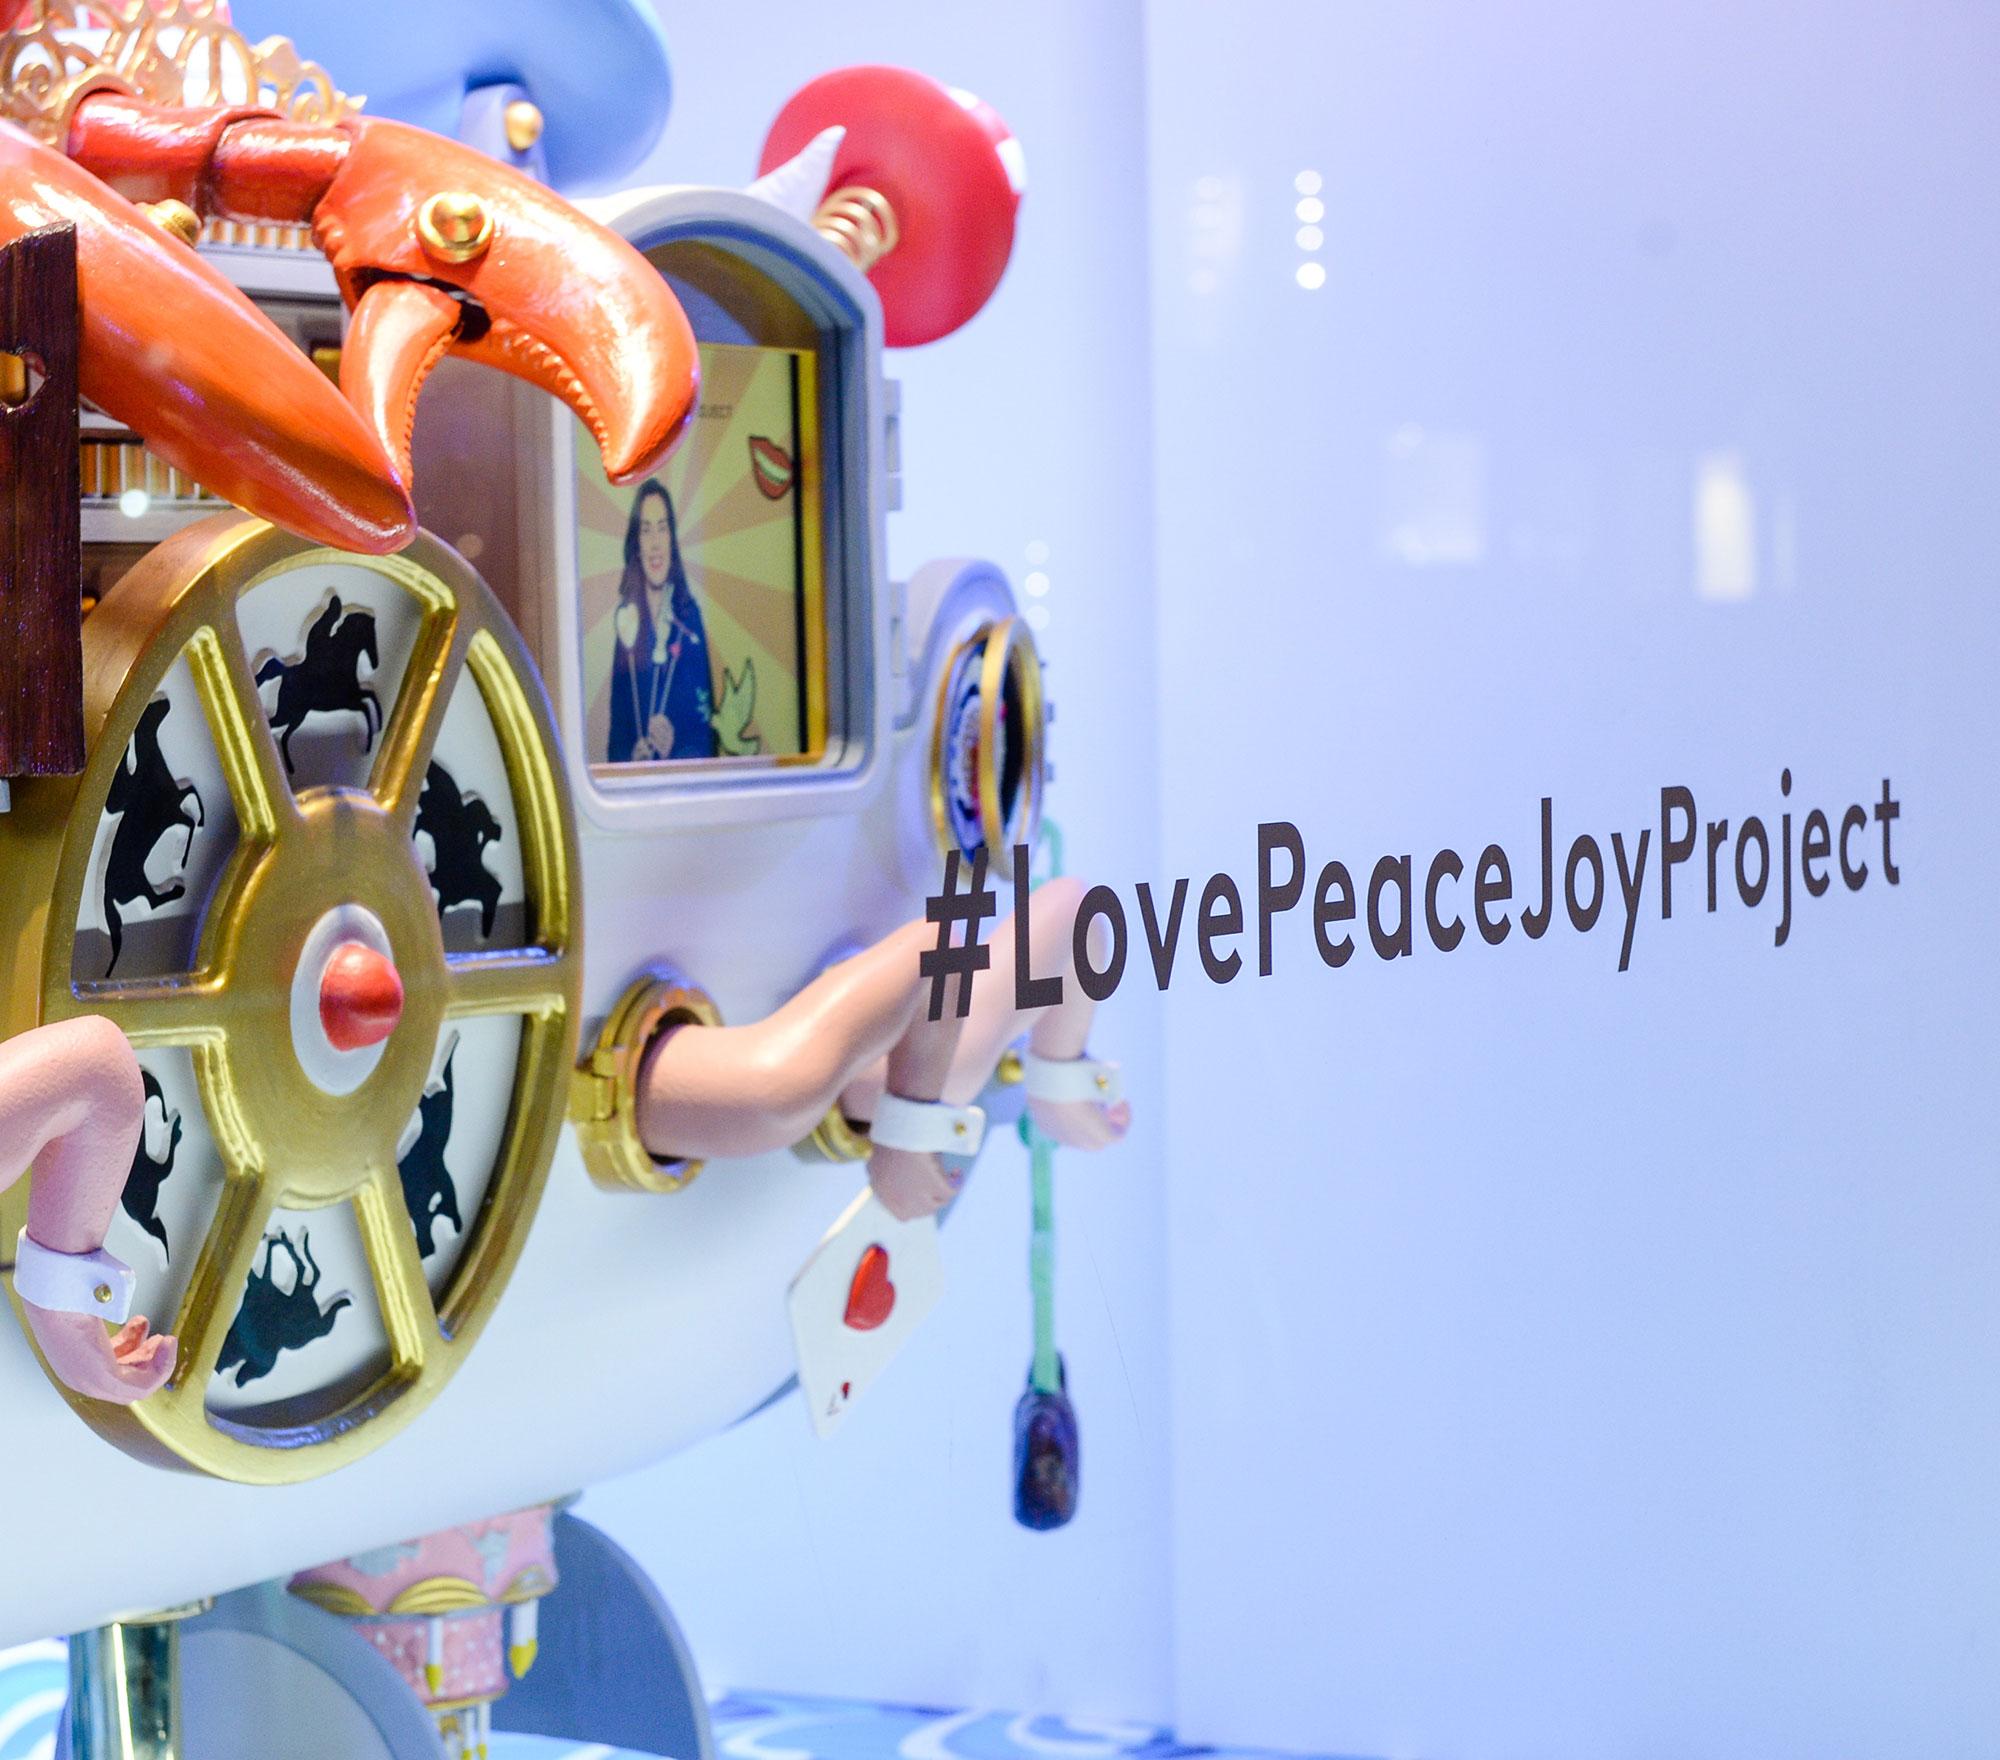 love-peace-joy-project-studio-job